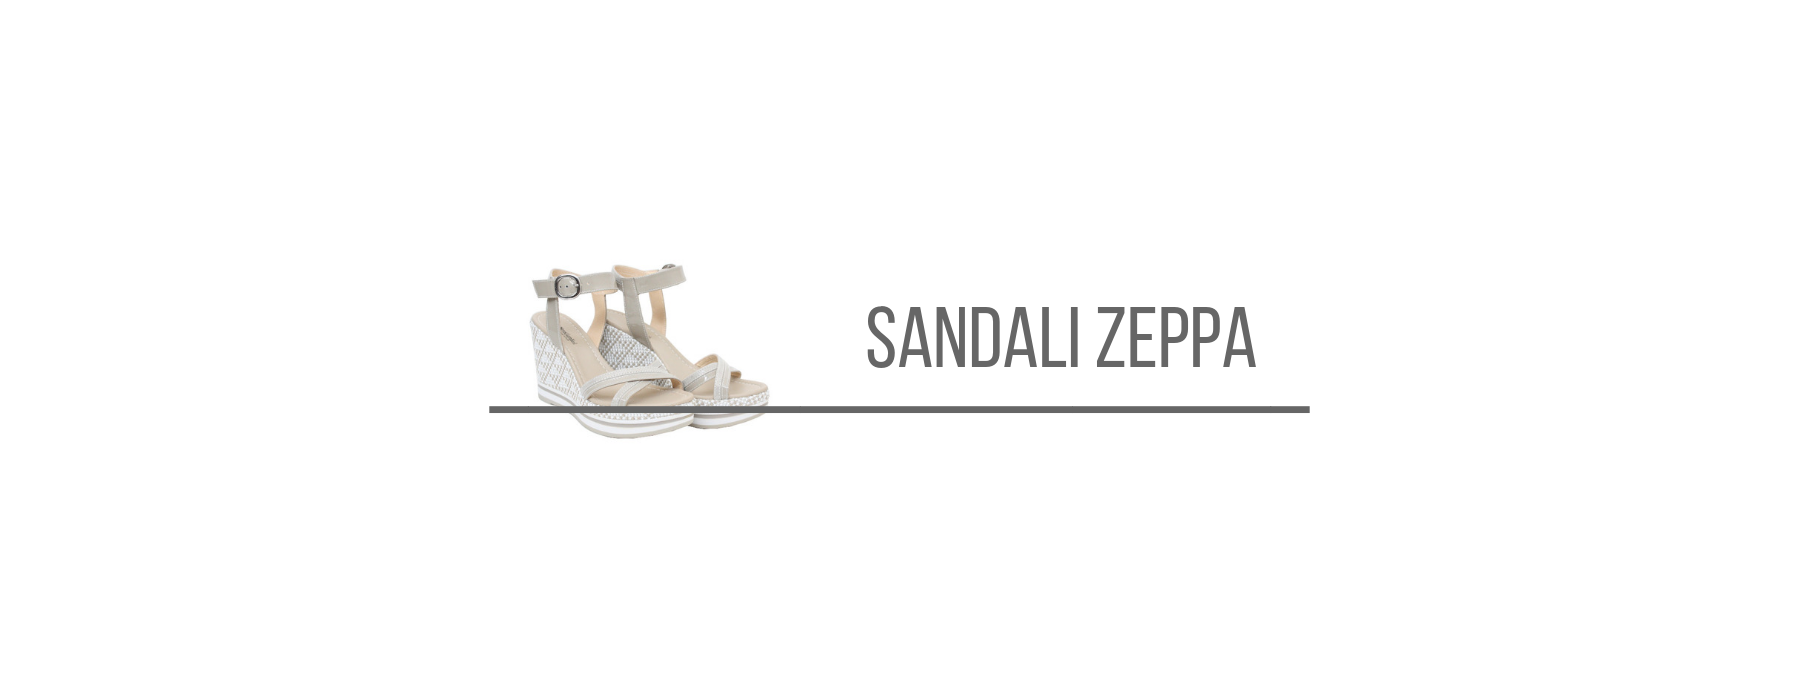 Sandali Zeppa